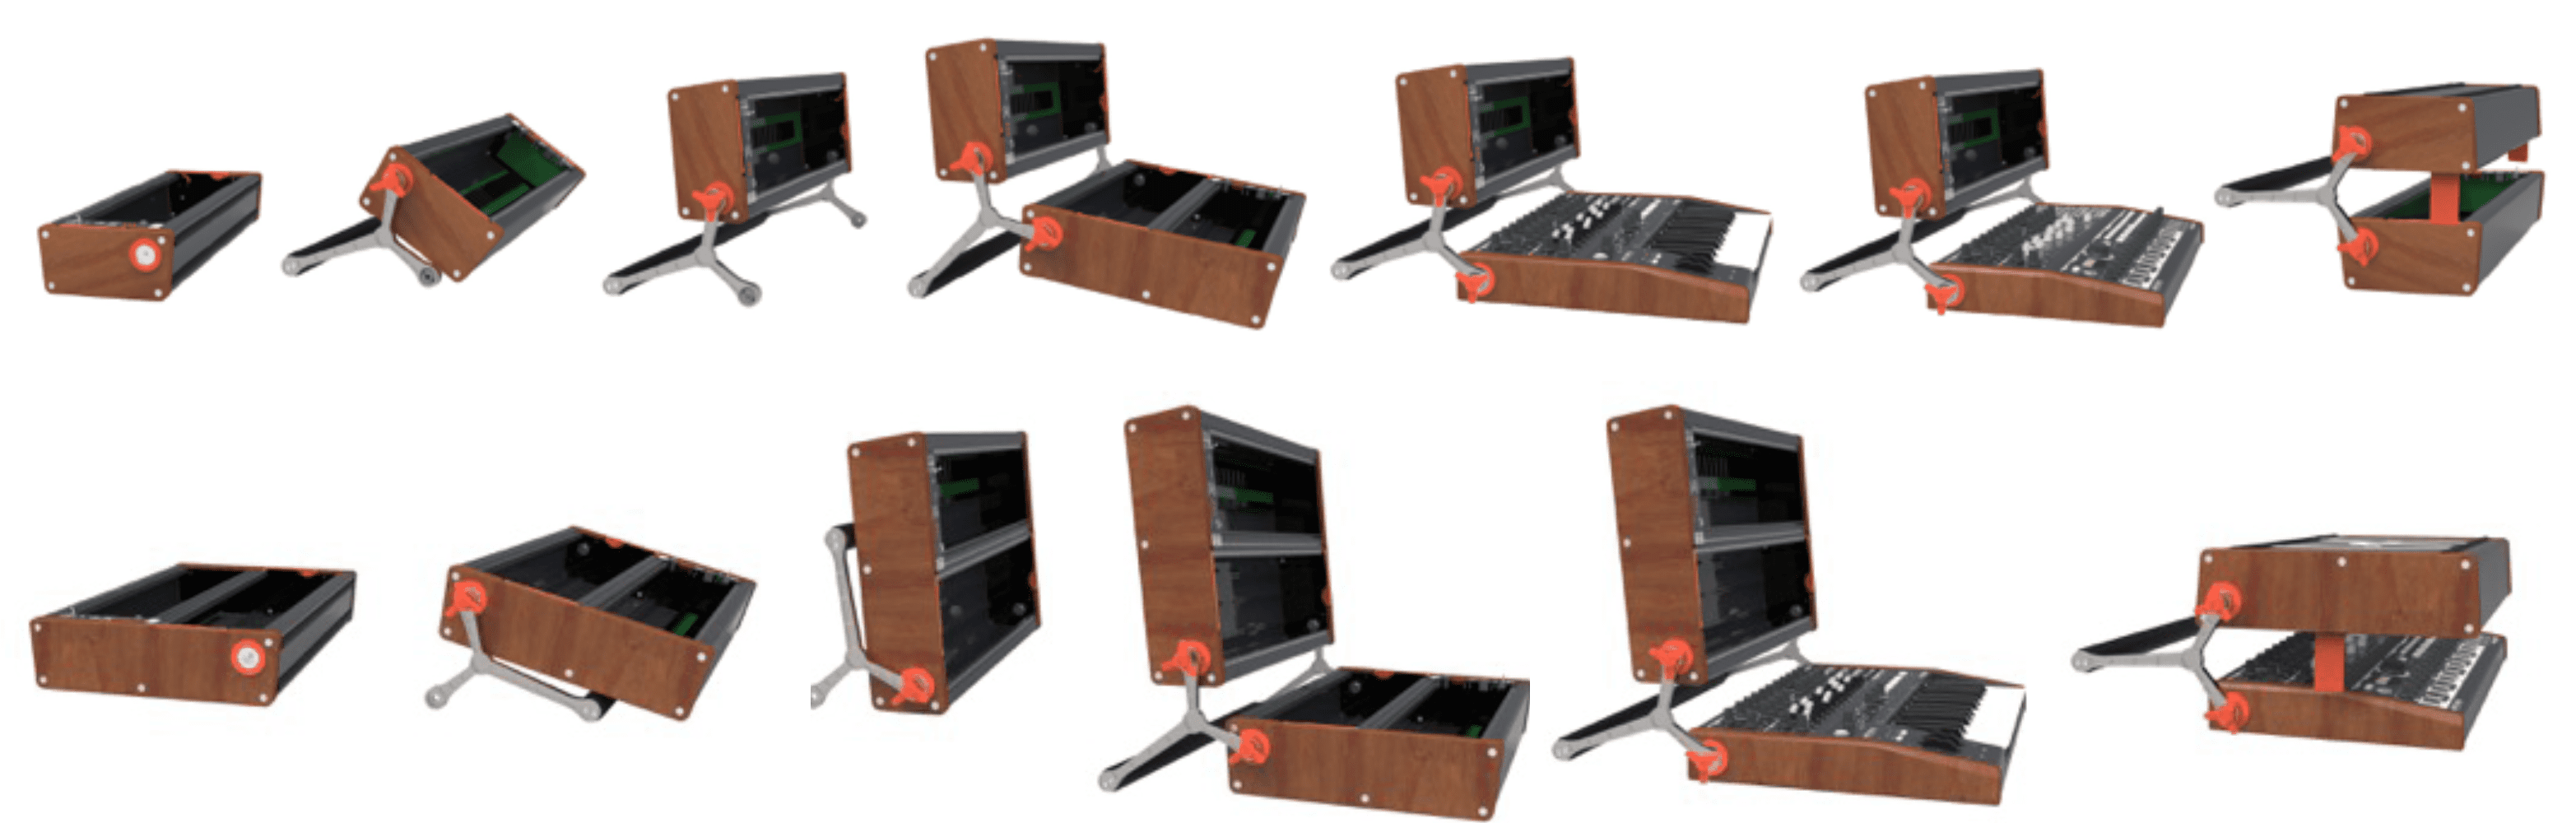 arturia rackbrute eurorack klapp system f r minibrute. Black Bedroom Furniture Sets. Home Design Ideas